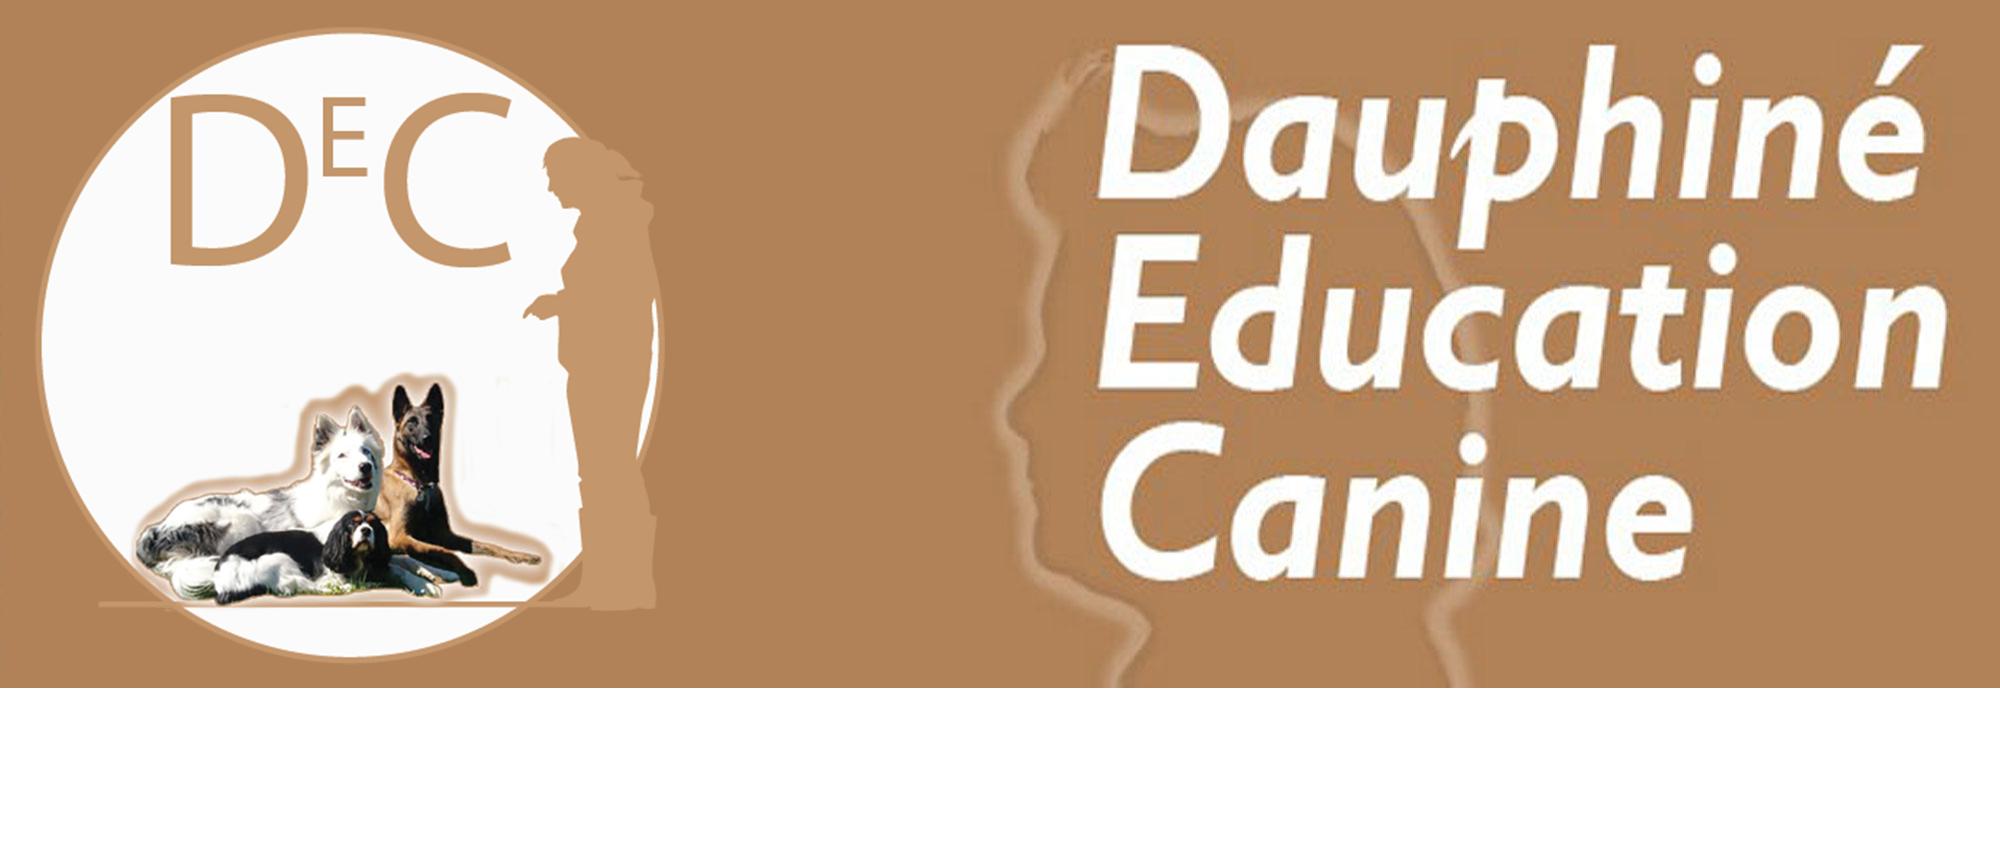 educationcanine38.com